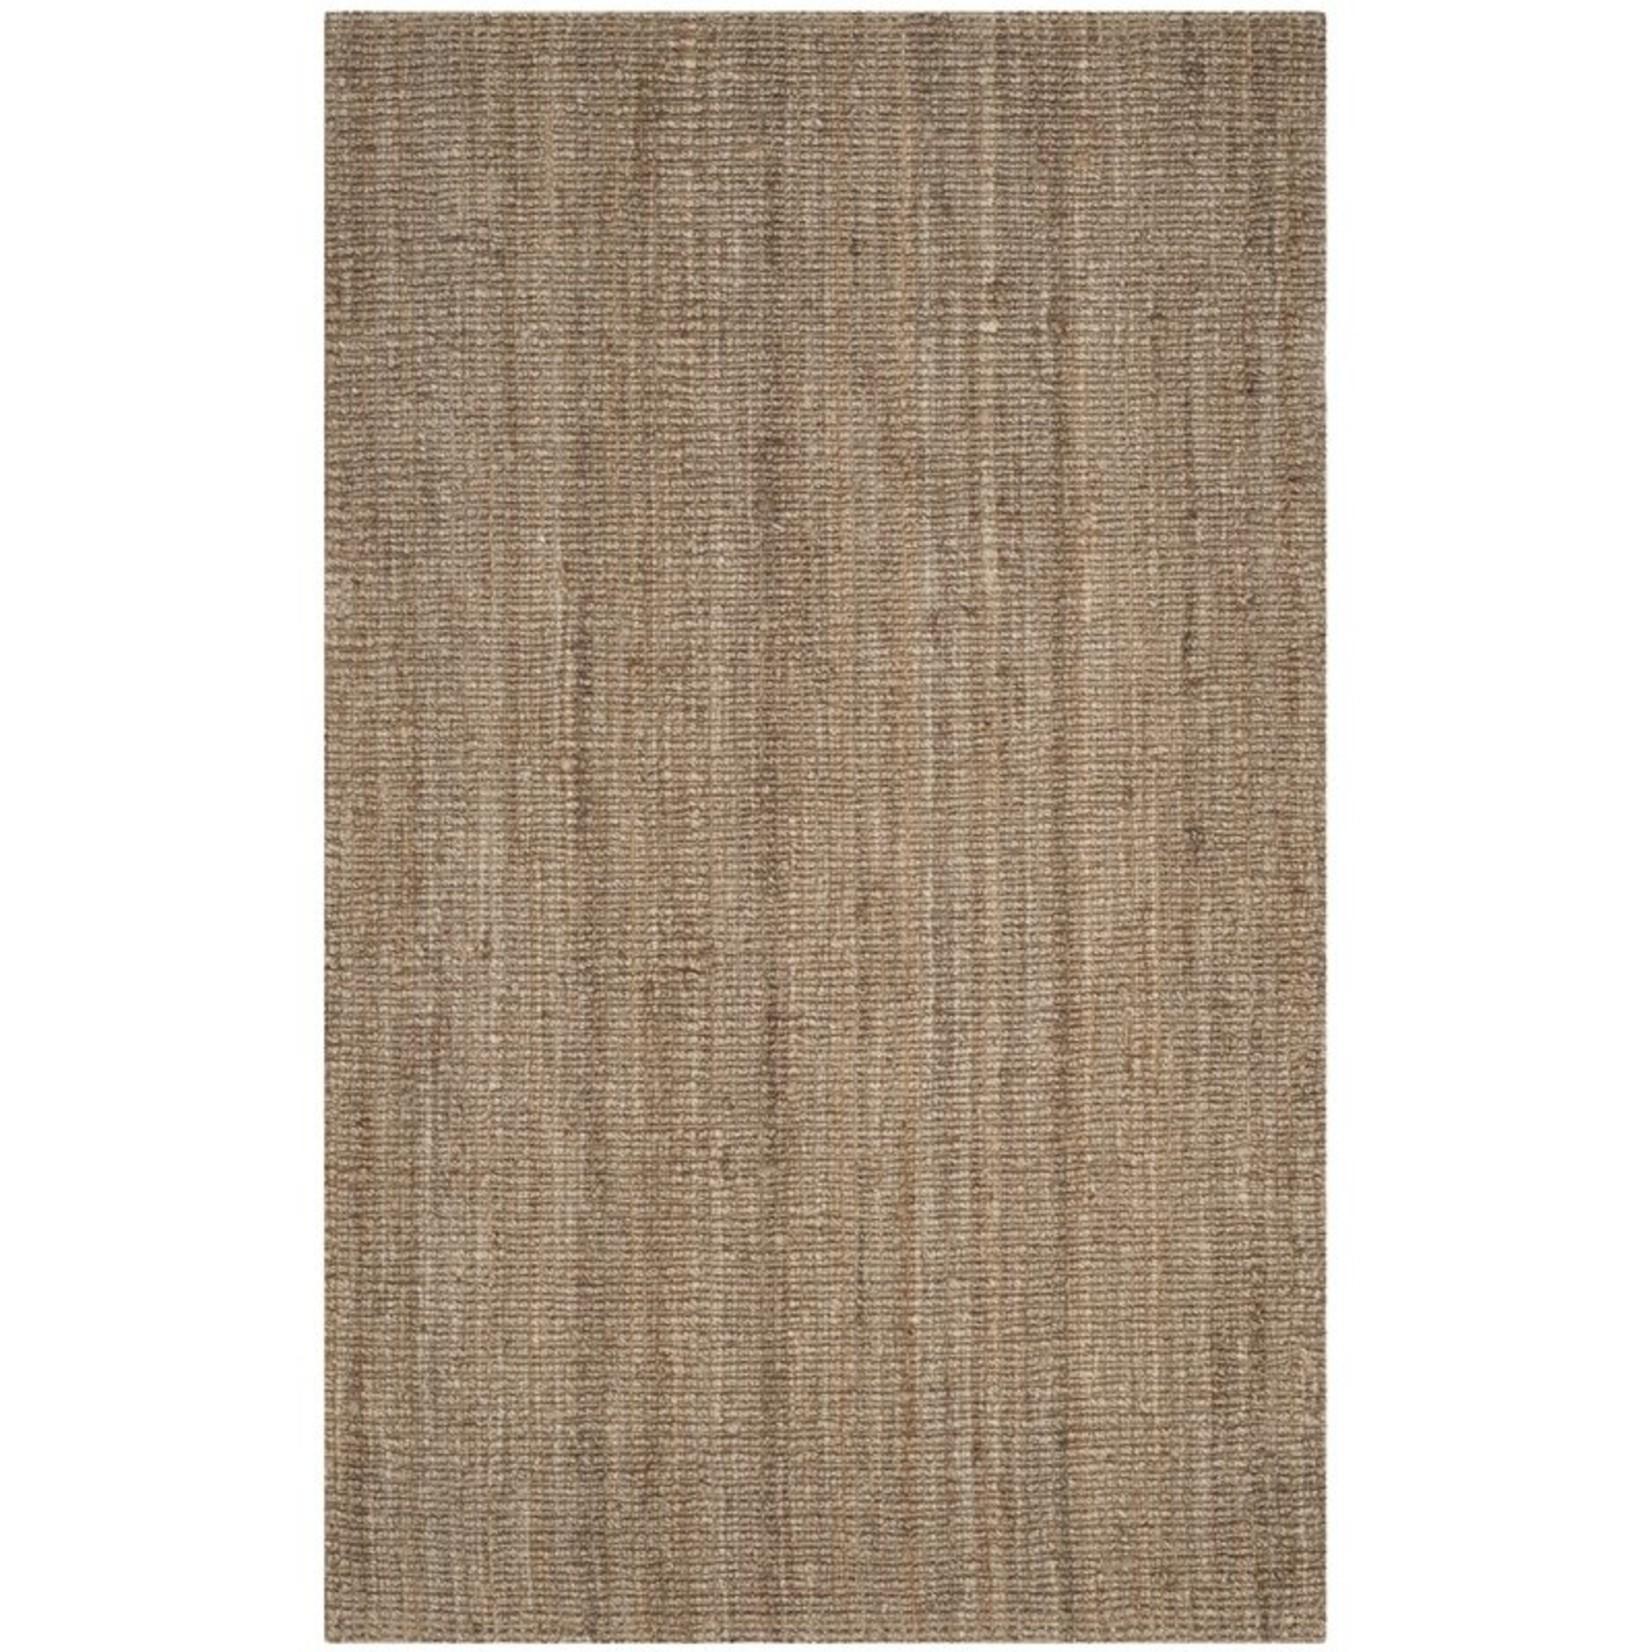 *4' x 6' - Nilies Natural/Grey Rug